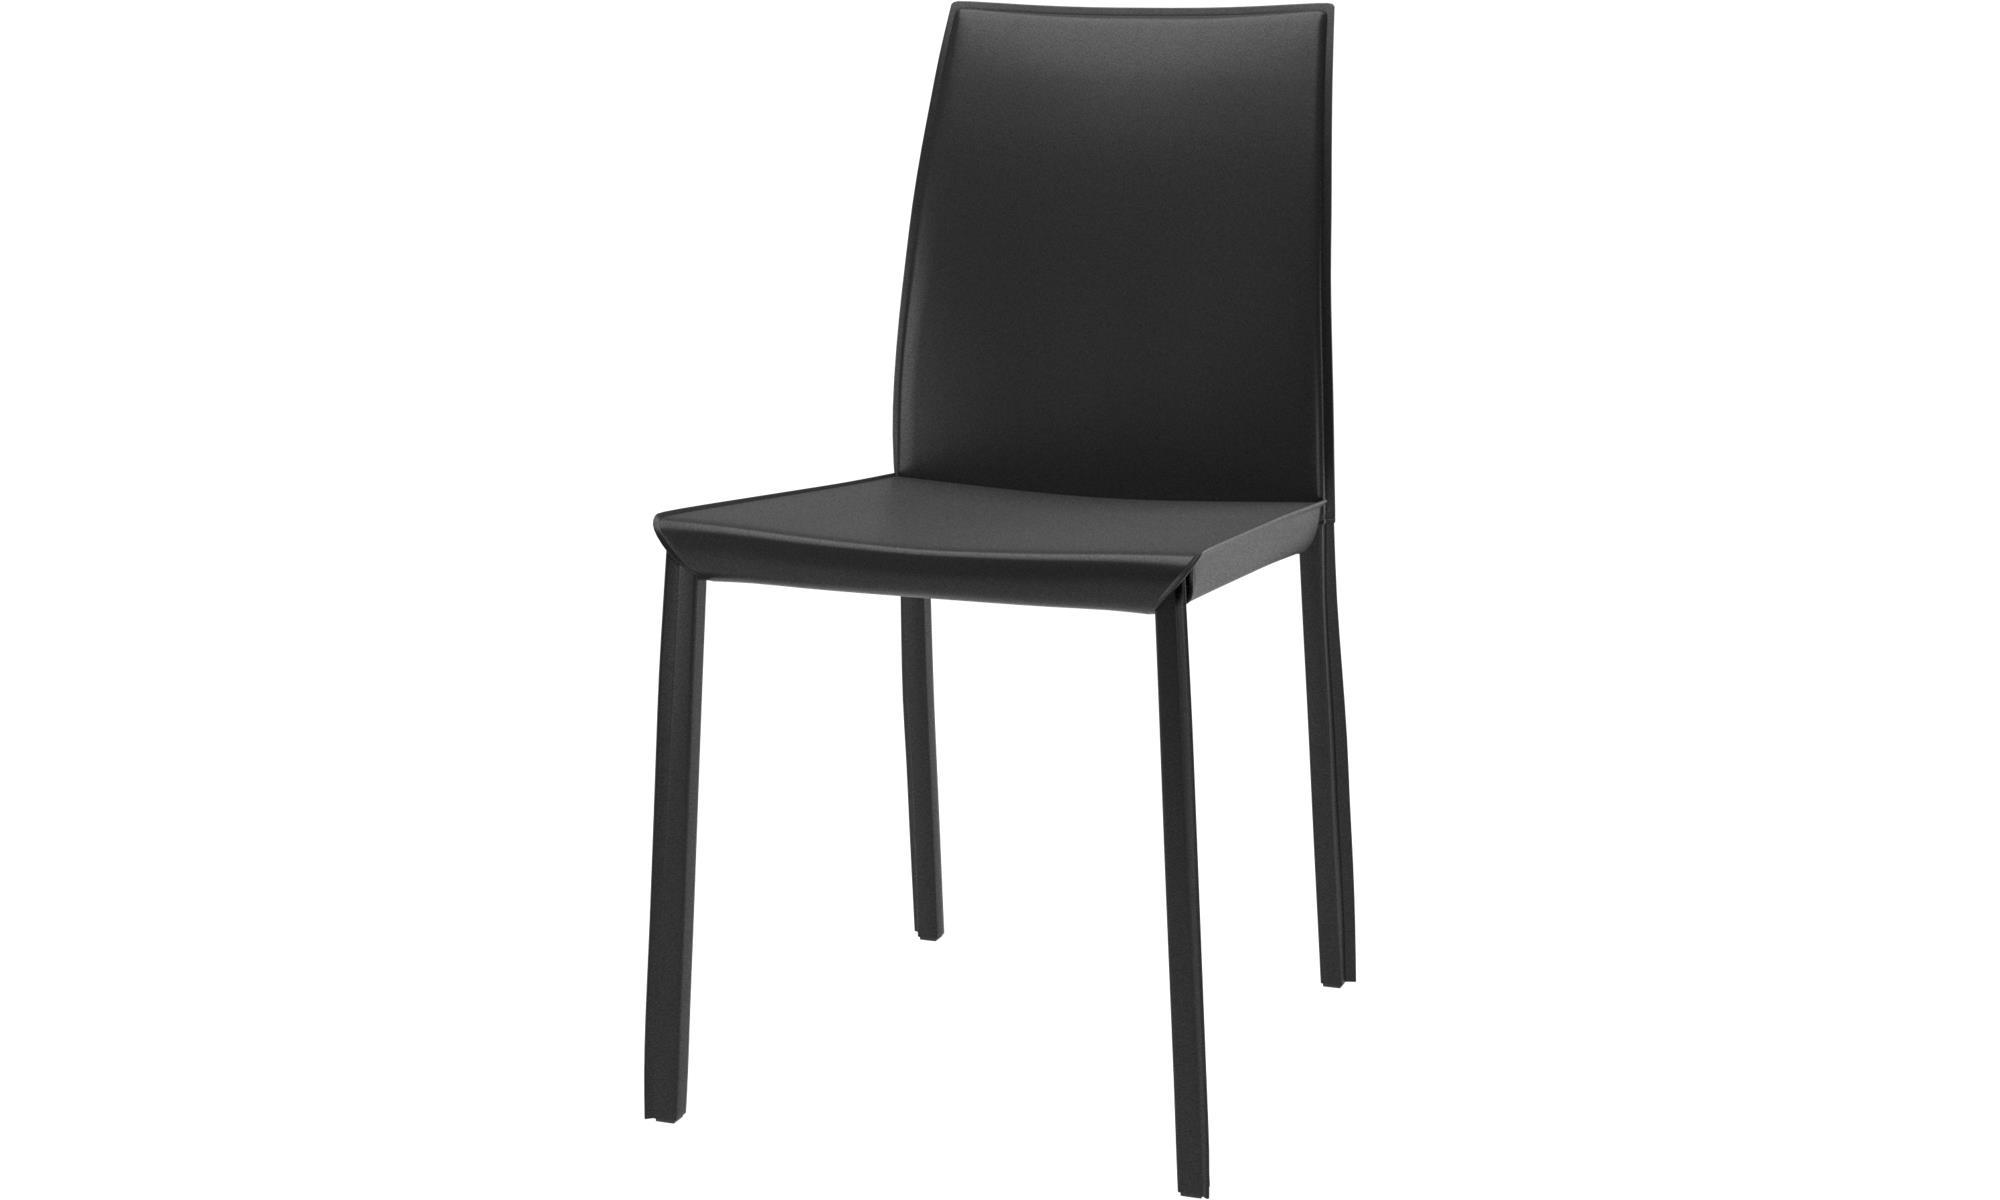 Chaises de salle manger chaise zarra boconcept for Salle a manger 8 chaises